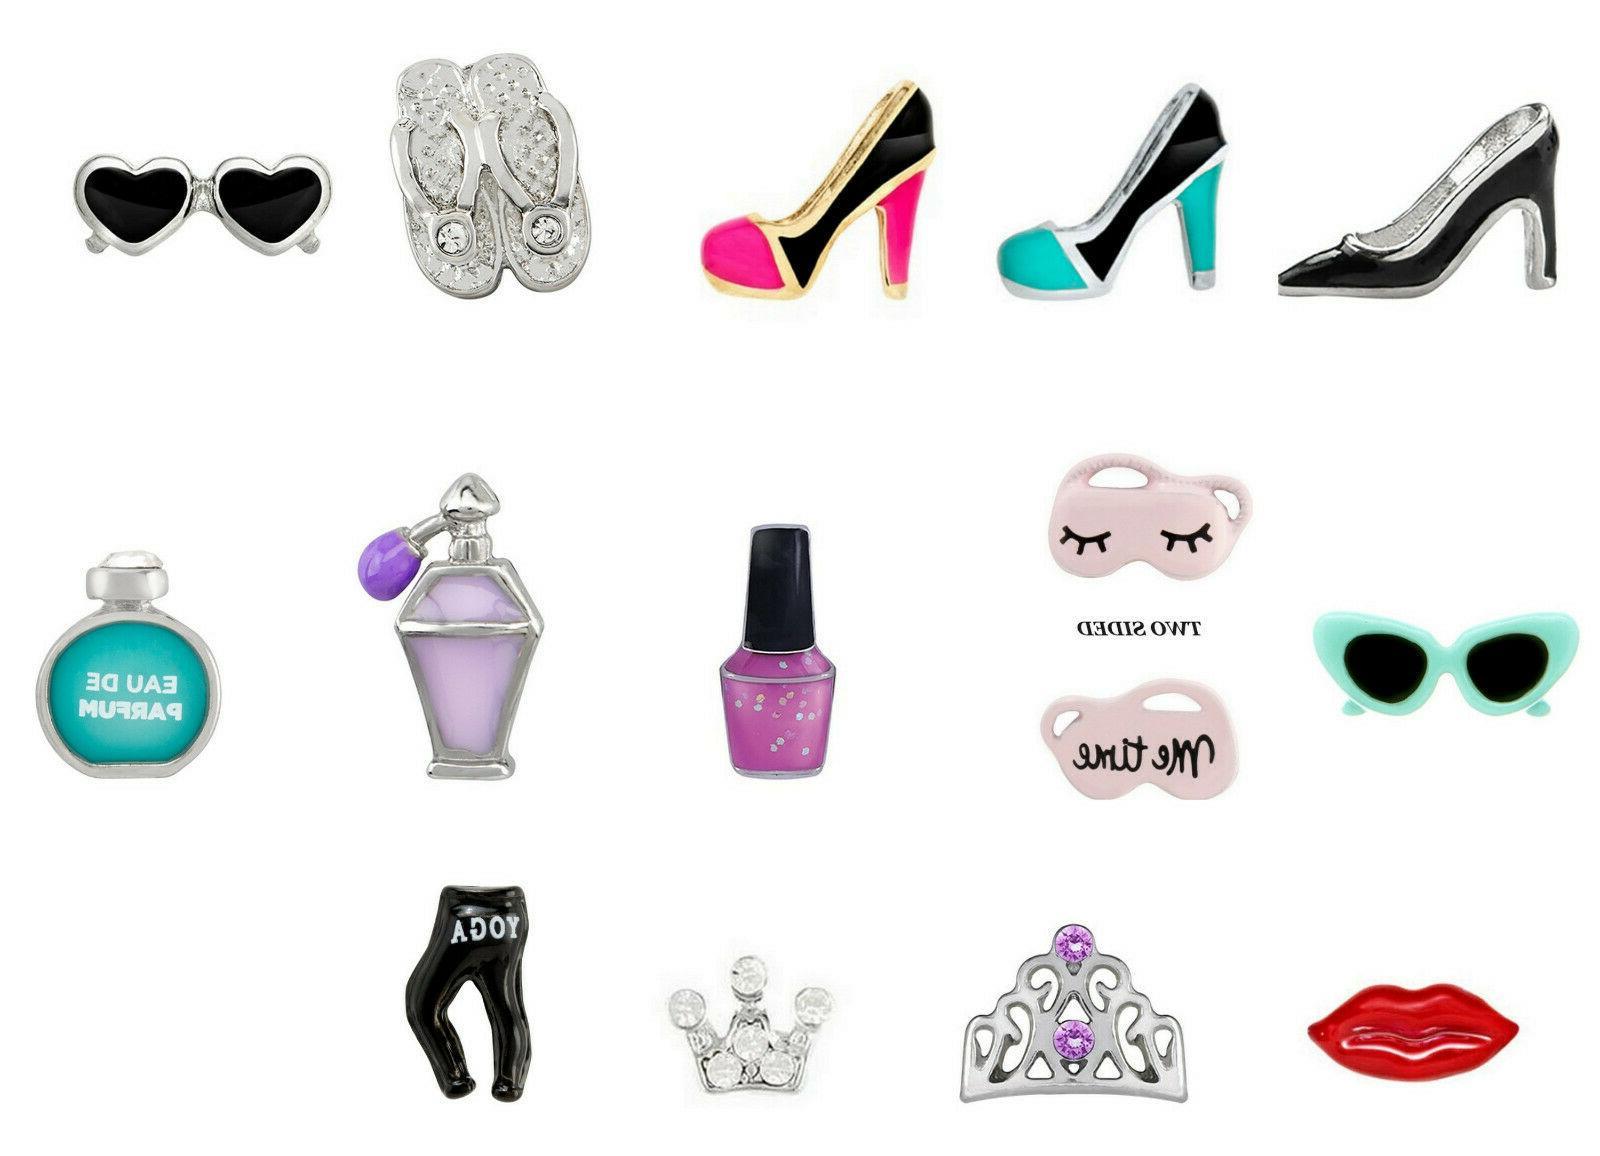 real charm heel sunglasses beach dress lipstick